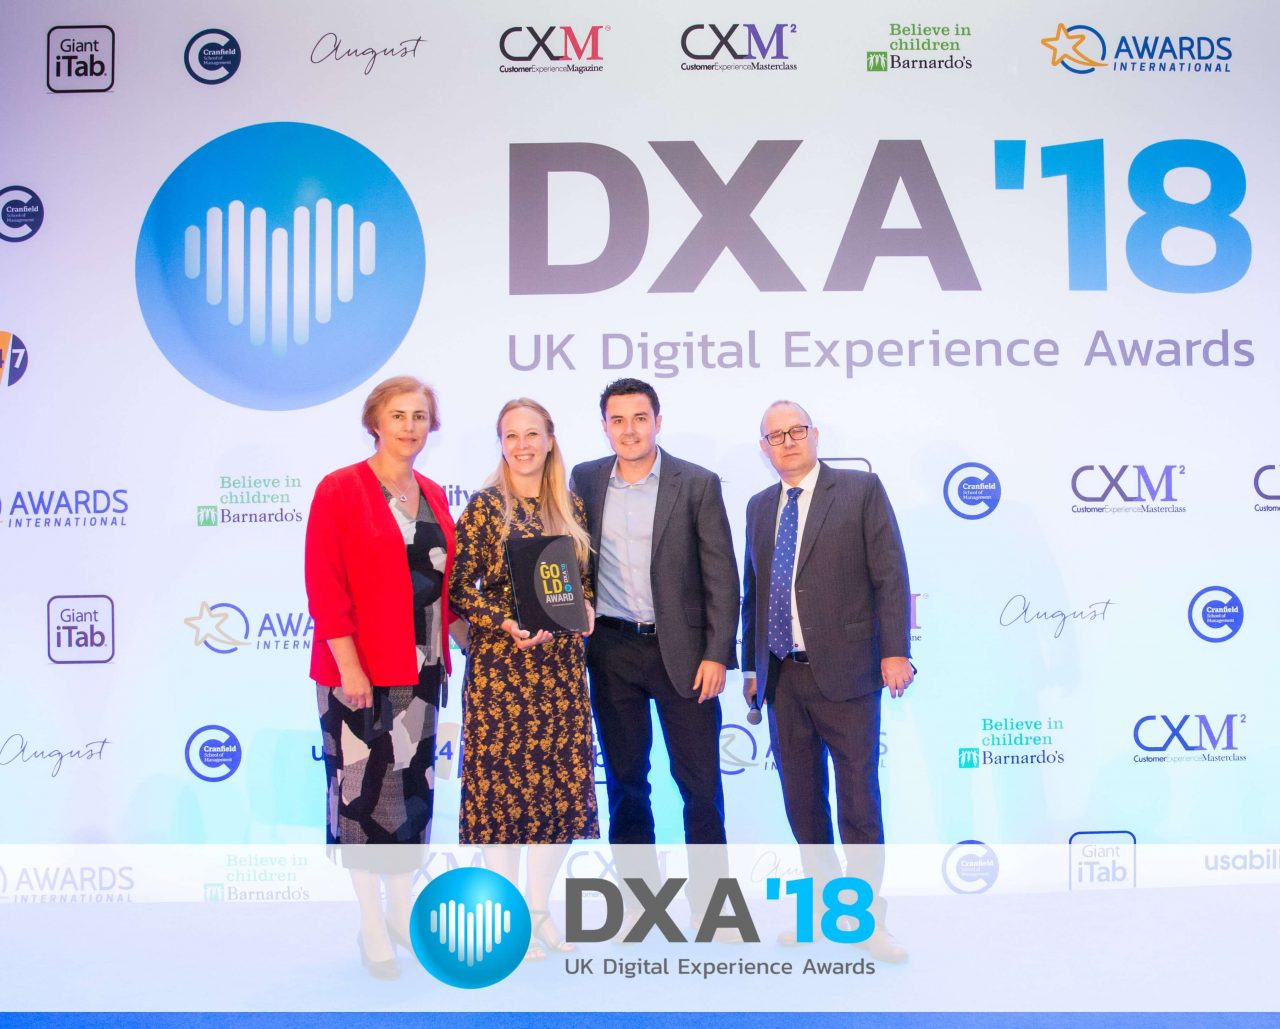 Best-Online-User-Experience-B2B-min-1280x1029.jpg